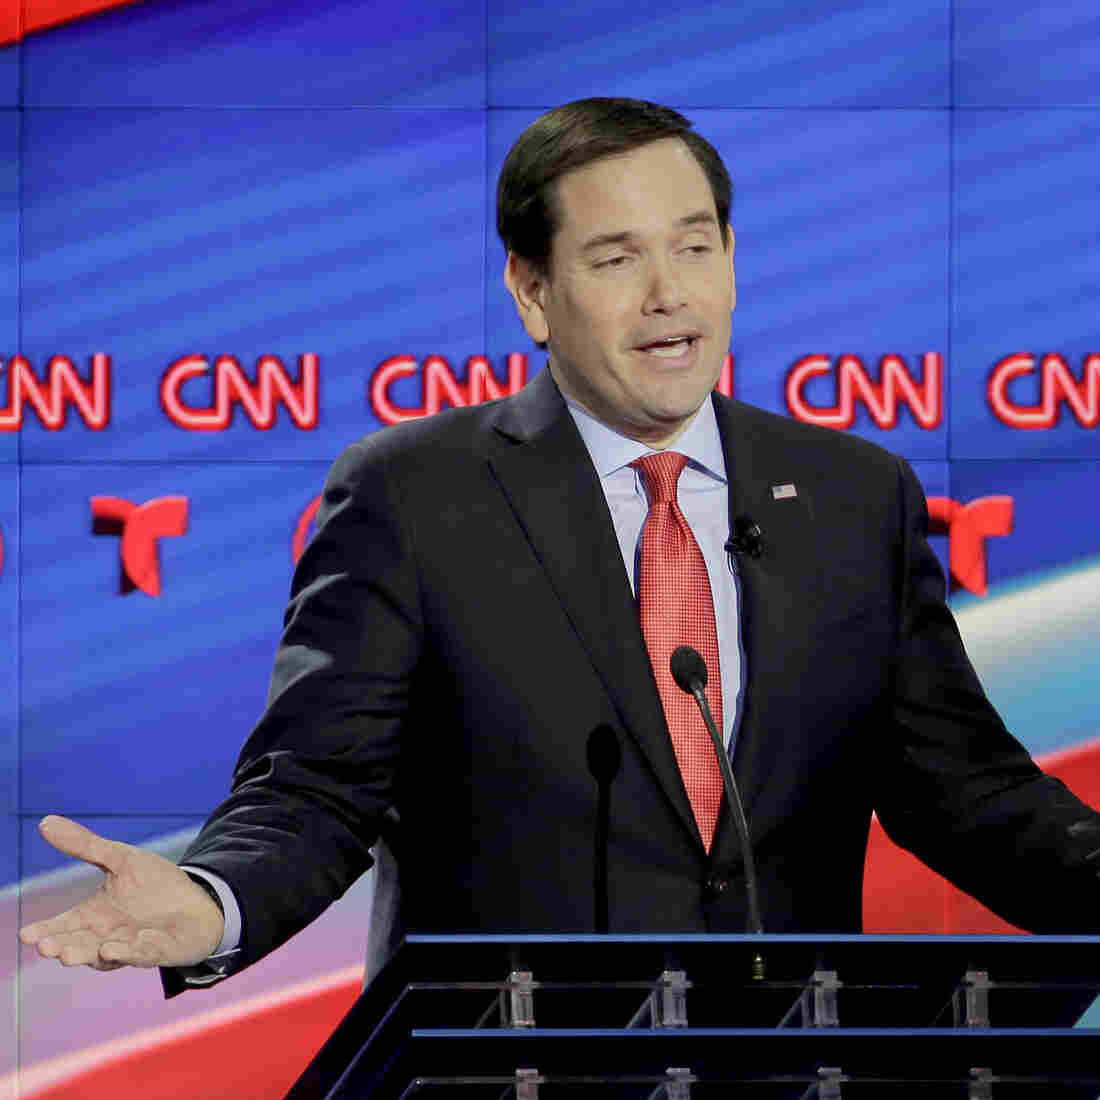 6 Takeaways From Thursday's Republican Debate